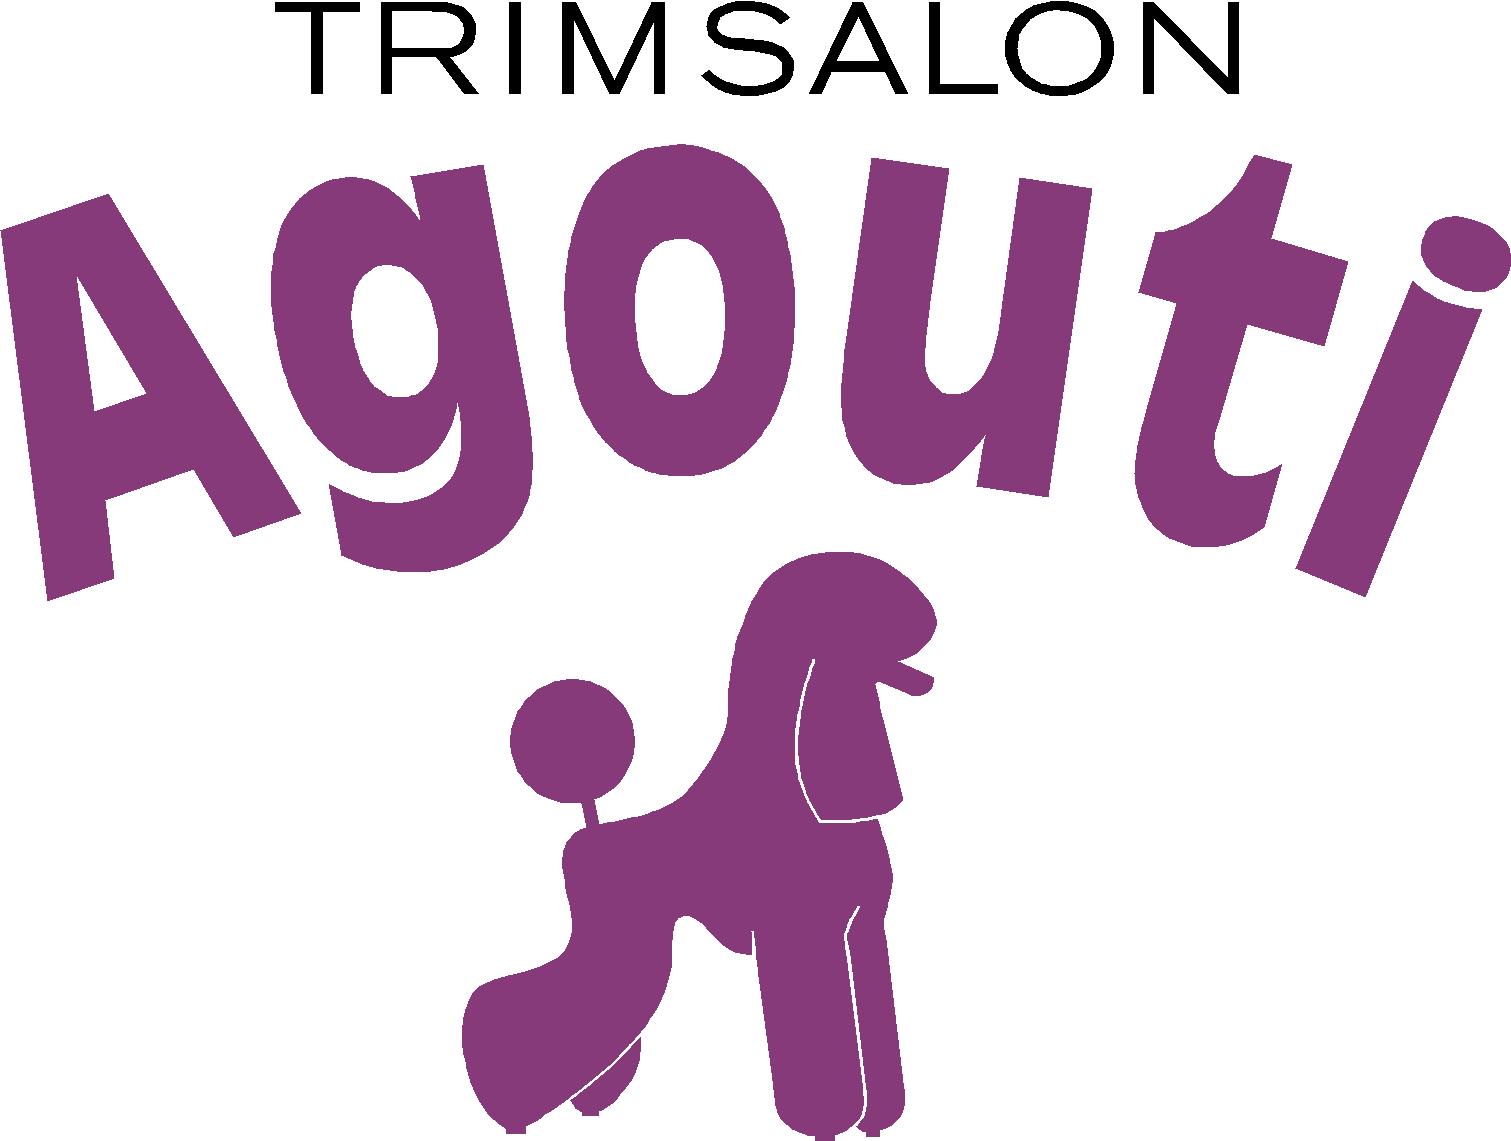 Trimsalon Agouti